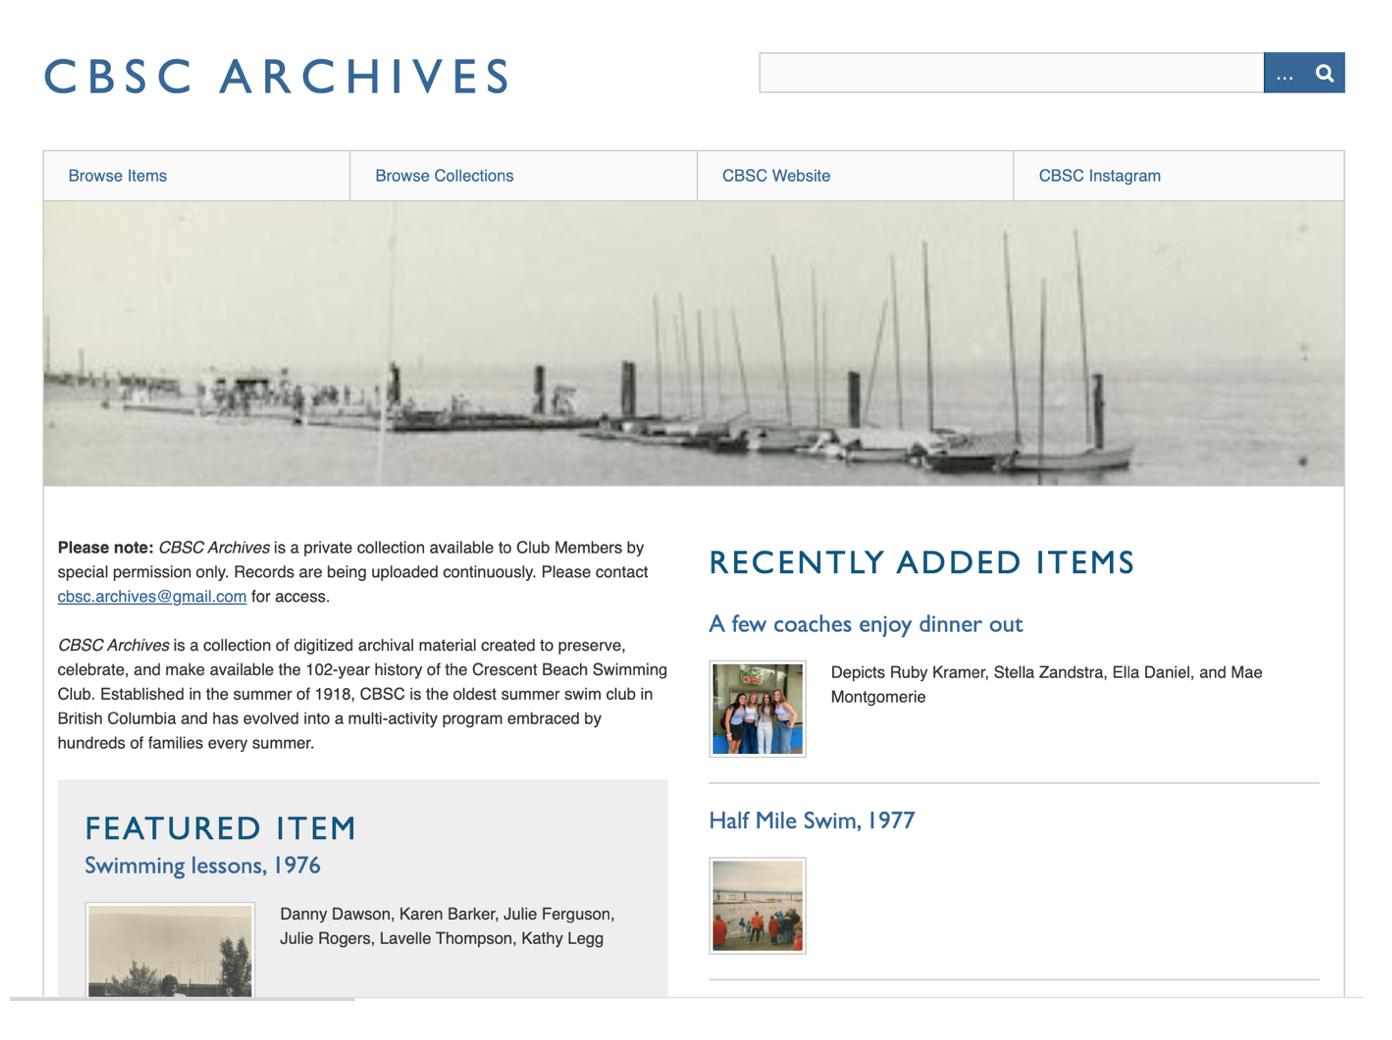 CBSC Archives